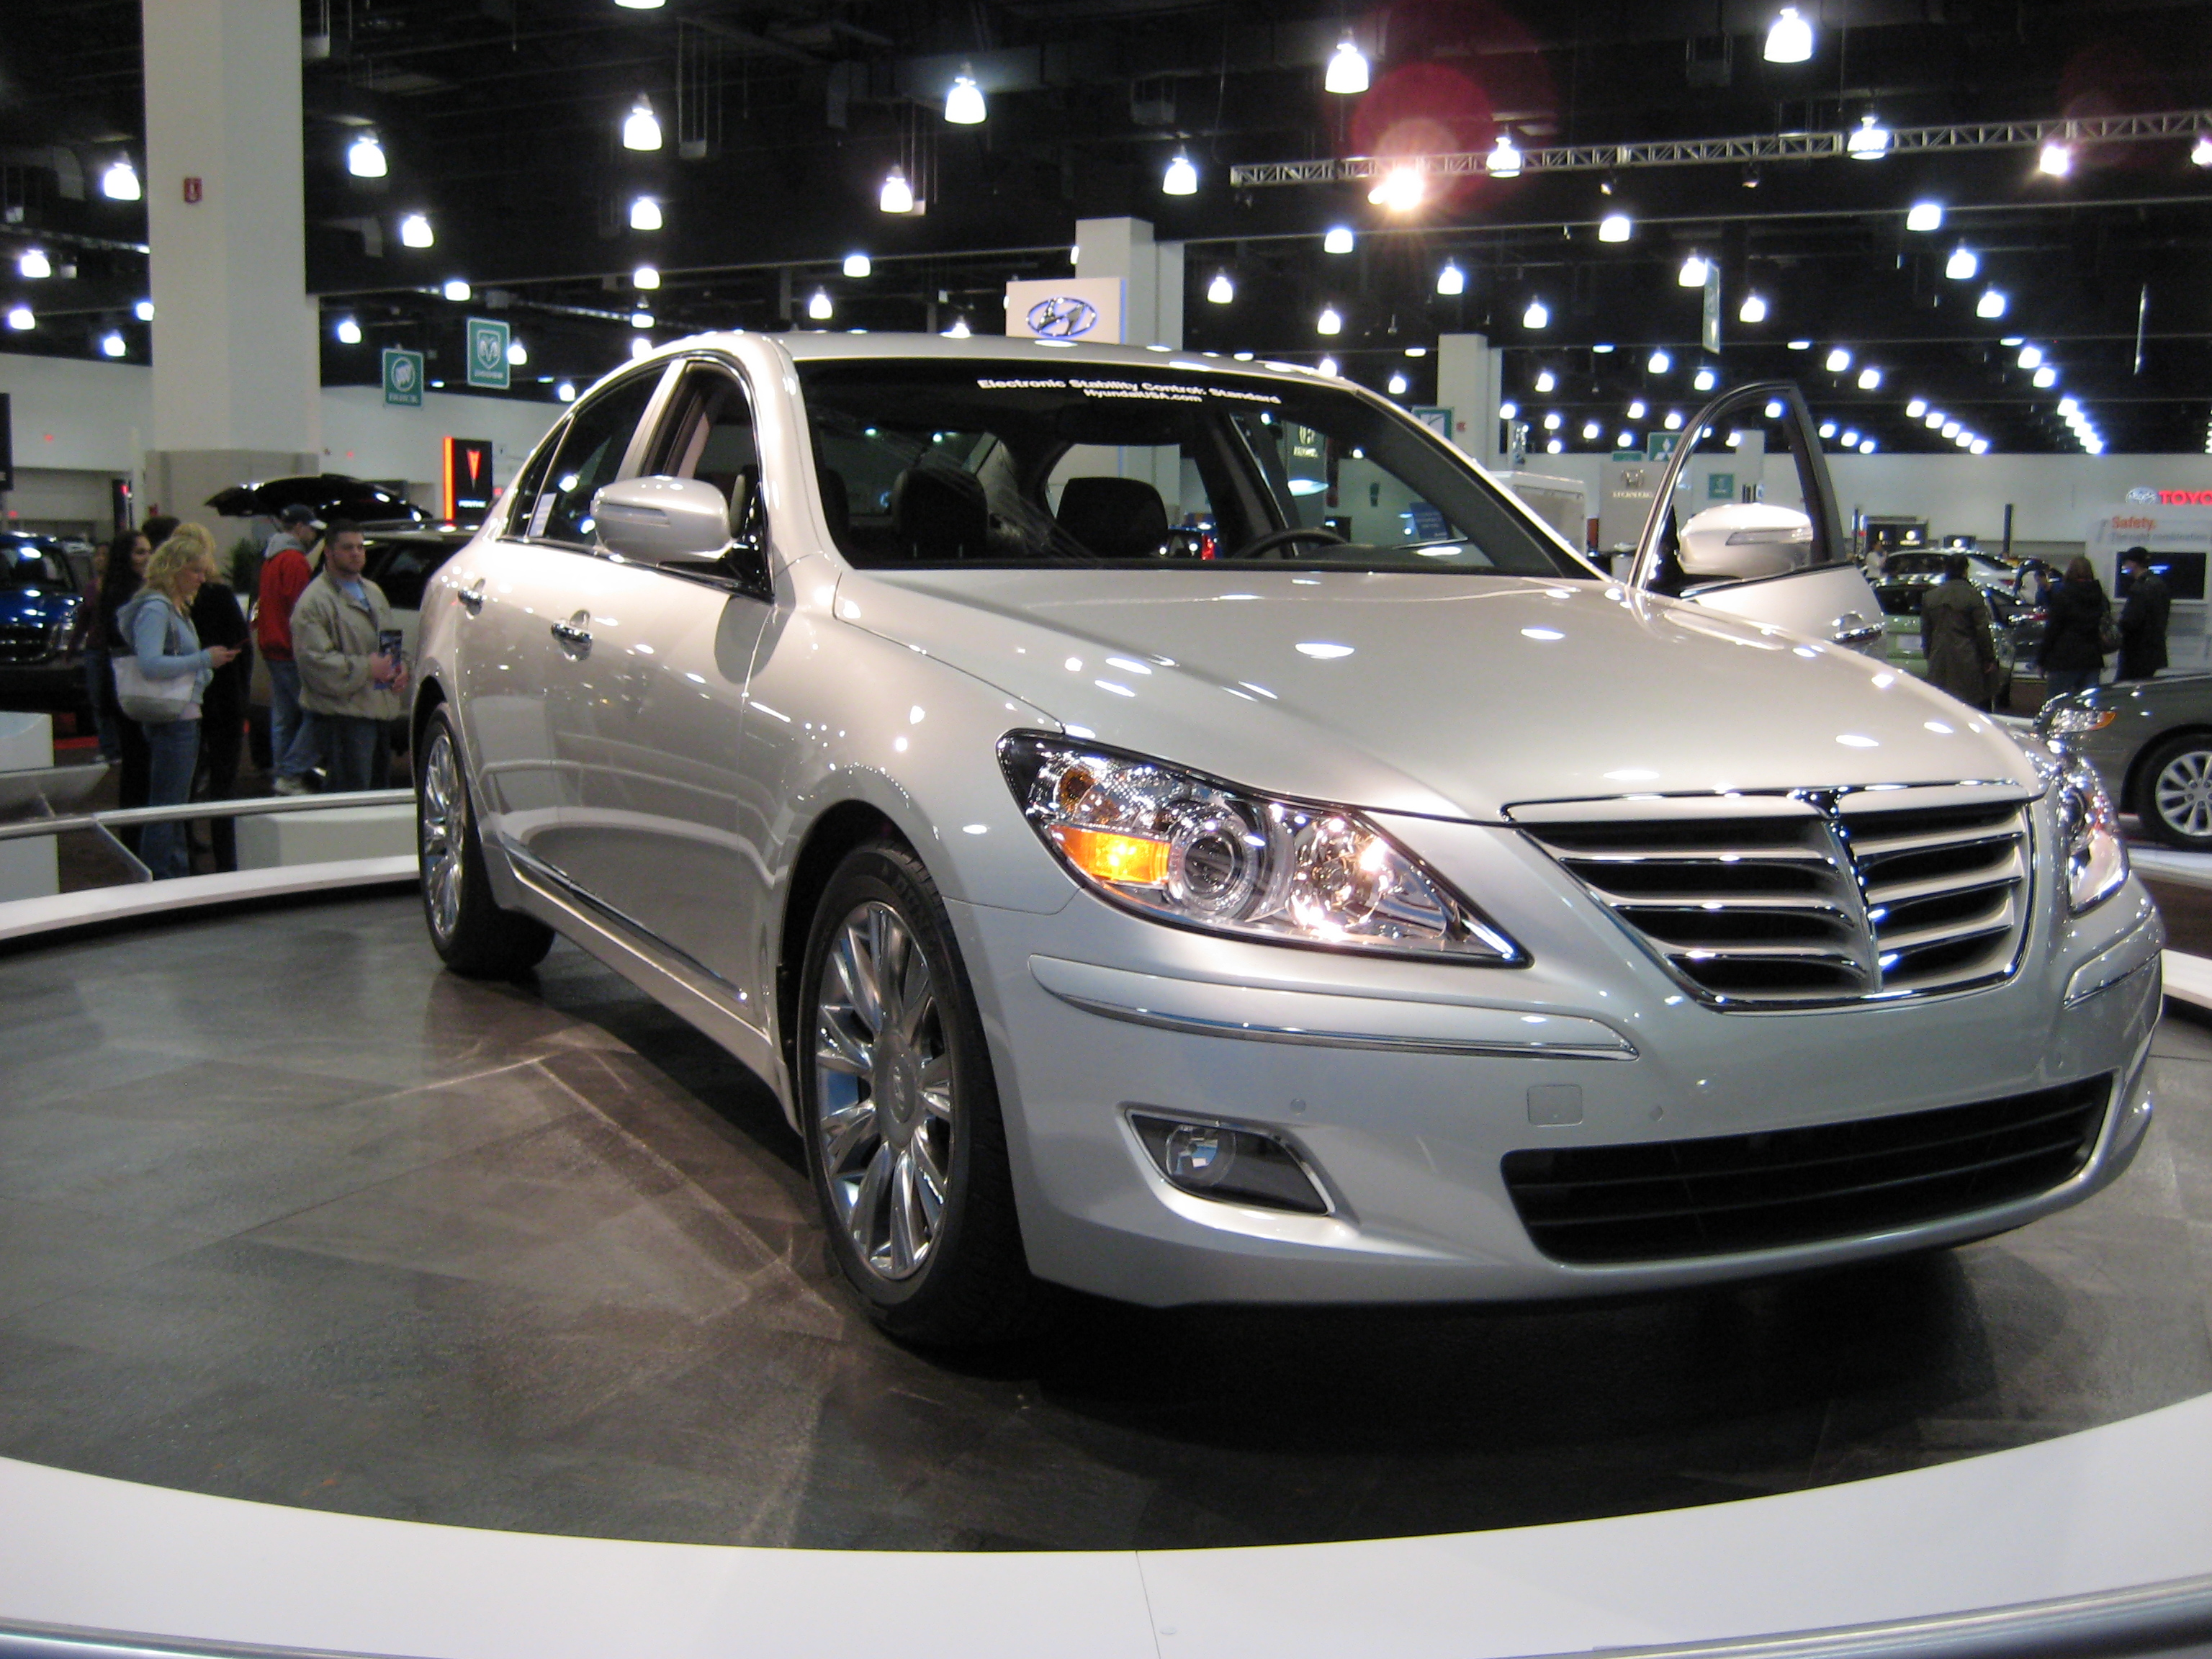 File:Hyundai Genesis.jpg - Wikimedia Commons